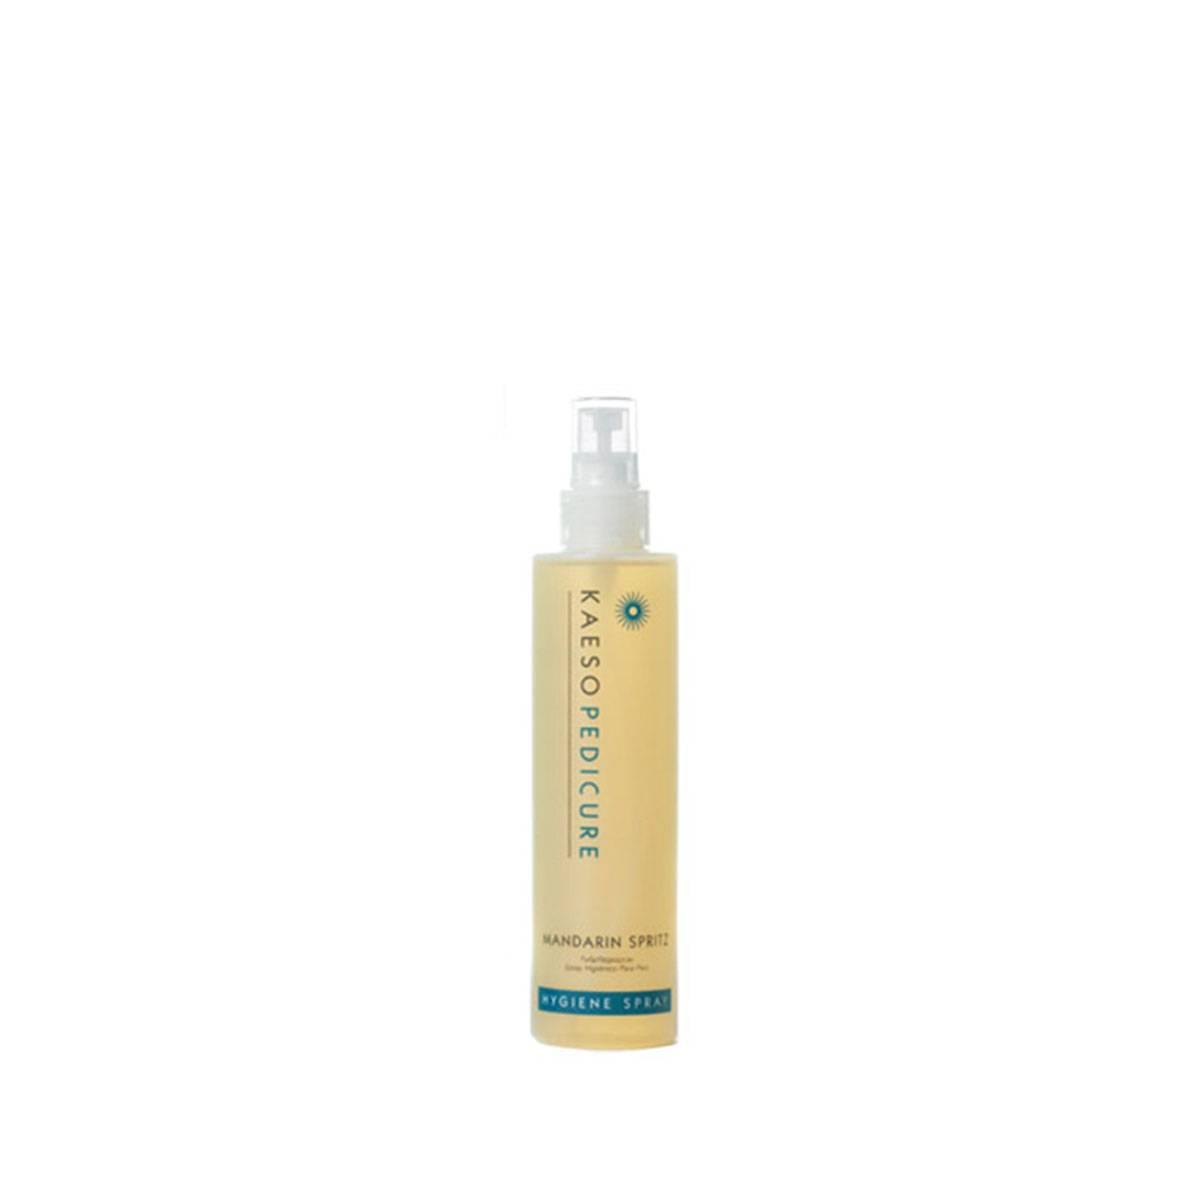 Cov-mandarin Spritz Foot Hygiene Spray 195ml*cat